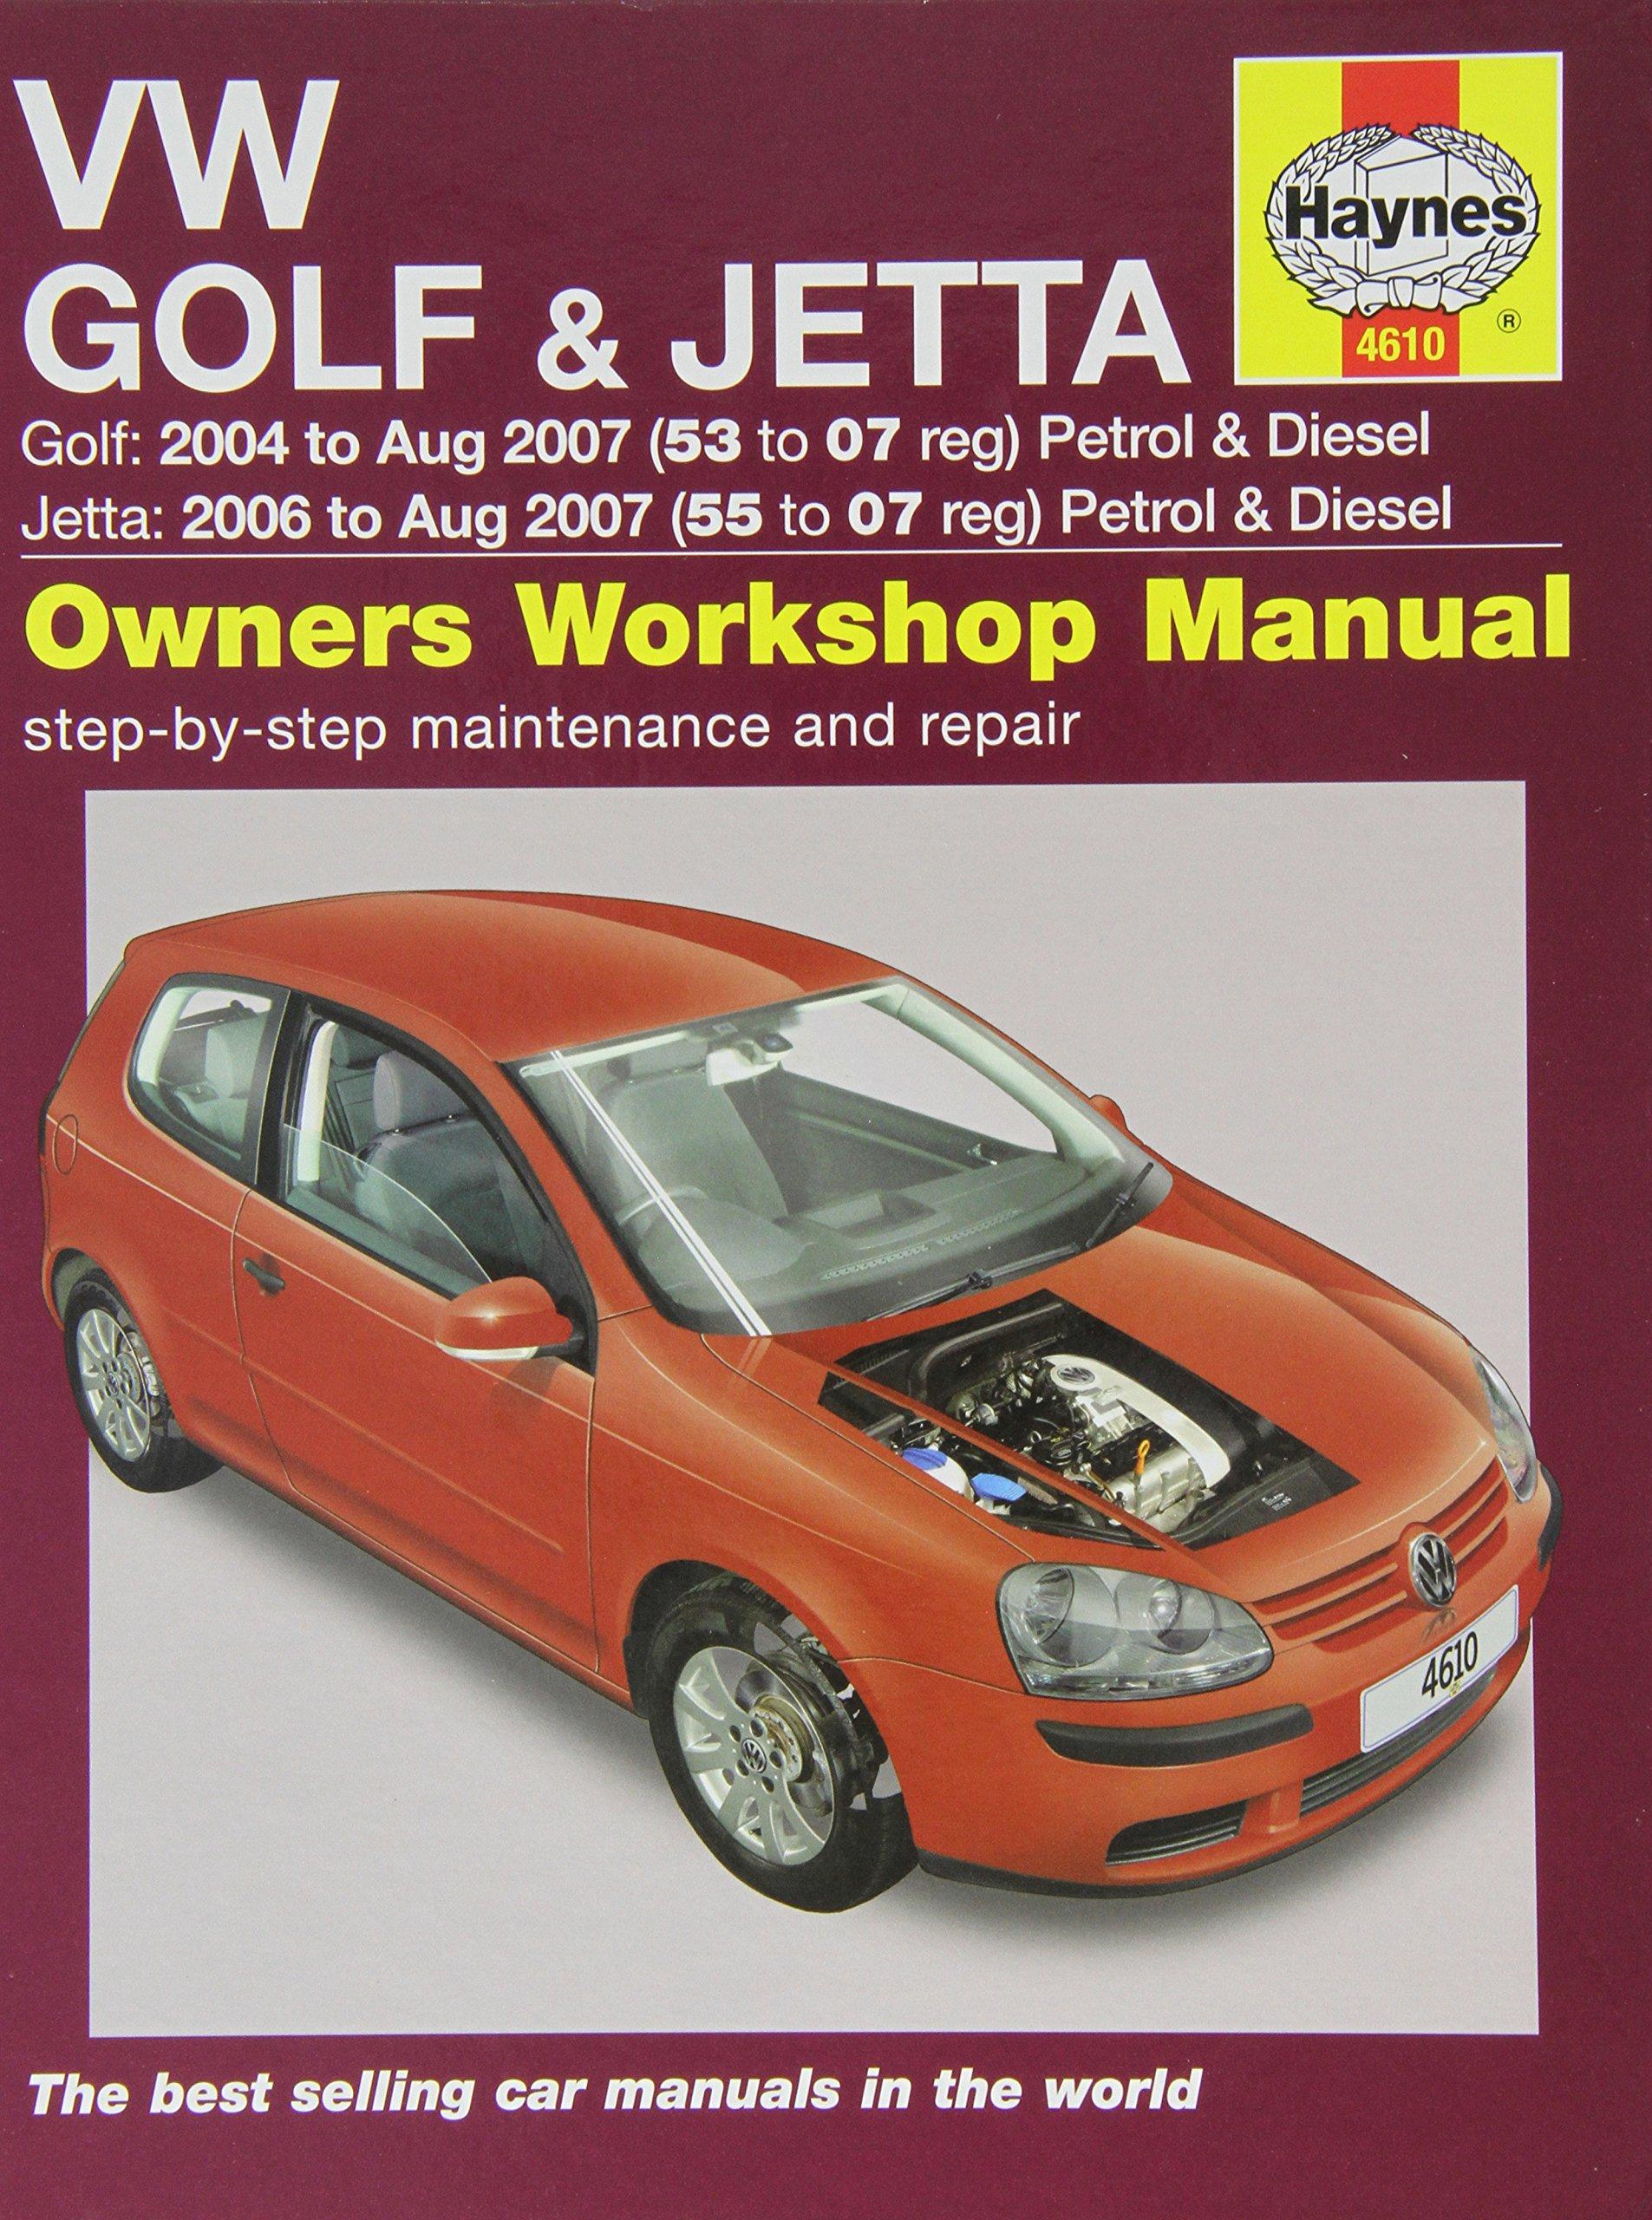 Haynes 4610 Car Maintenance Service and Repair Manual: Amazon.co.uk: Books